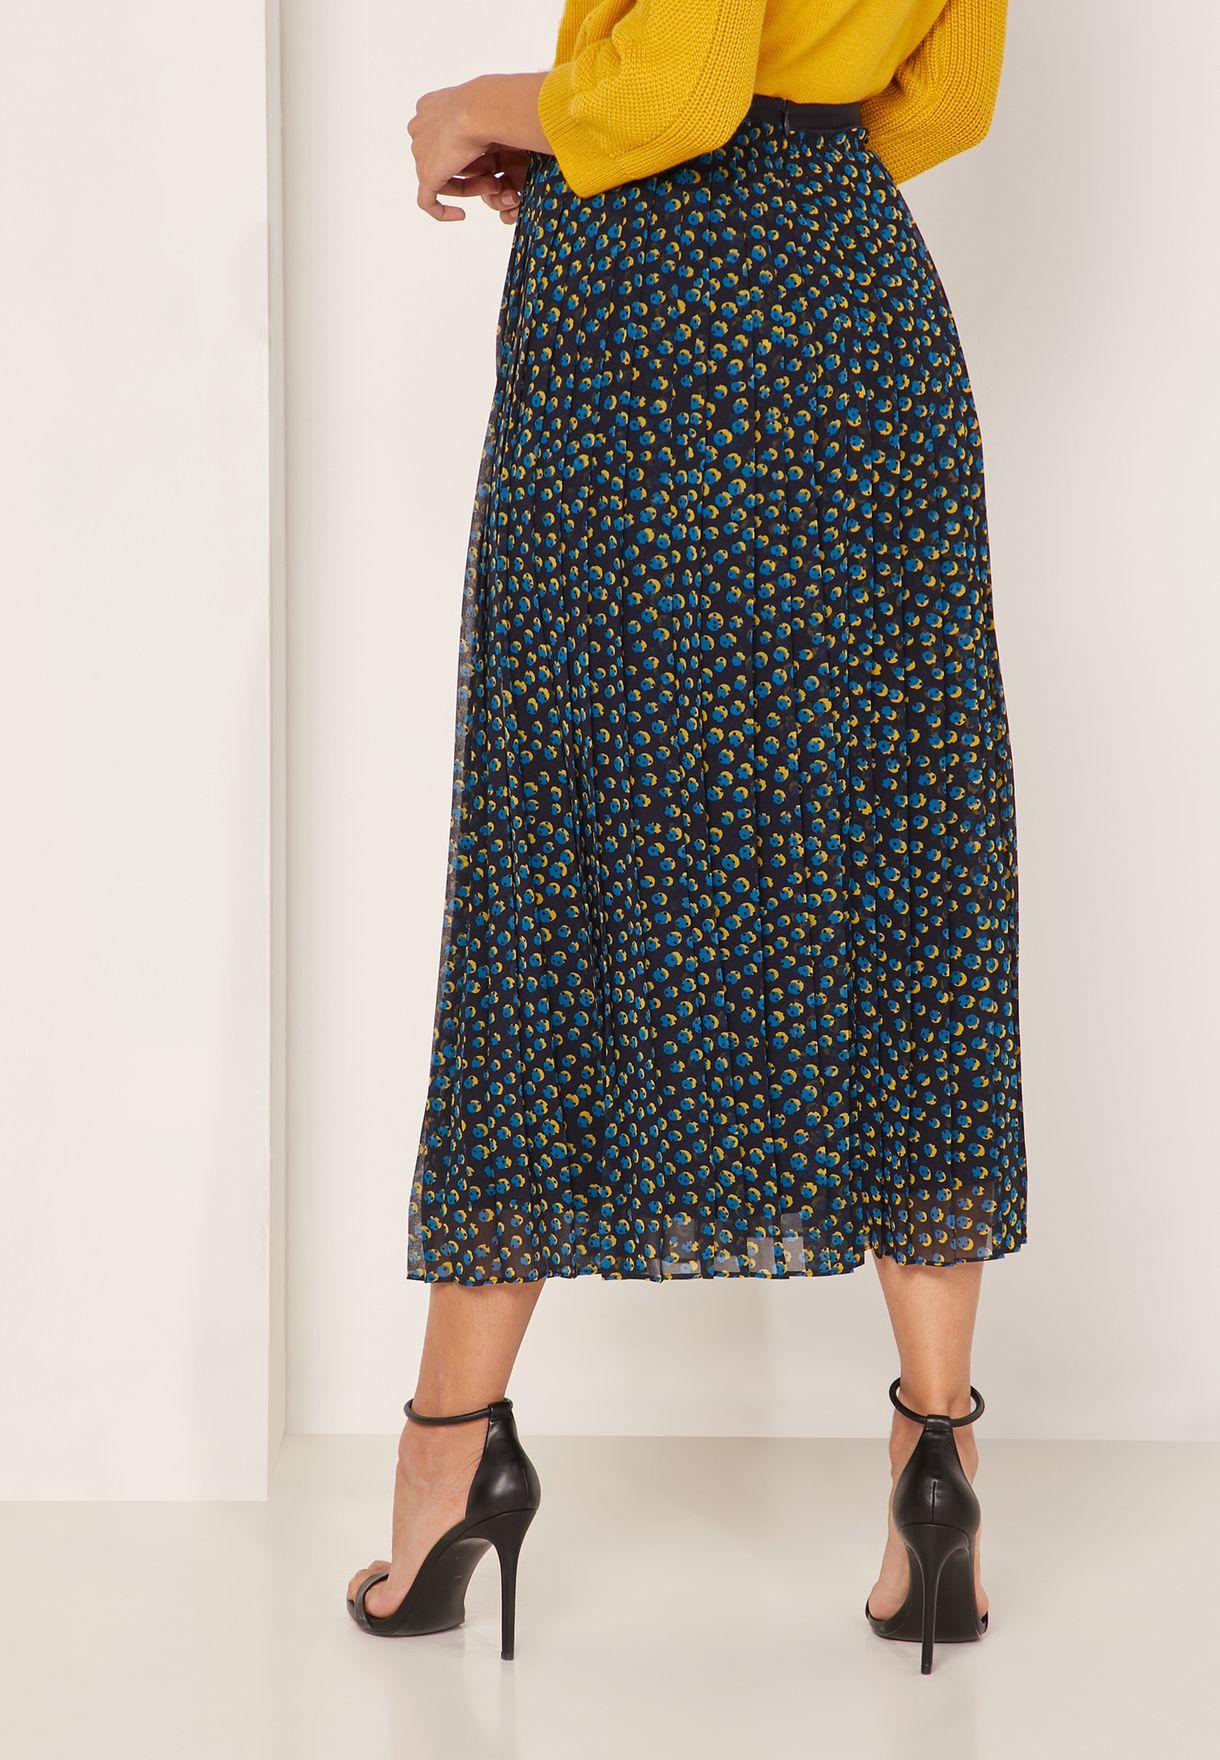 High Waist Pleated Printed Skirt